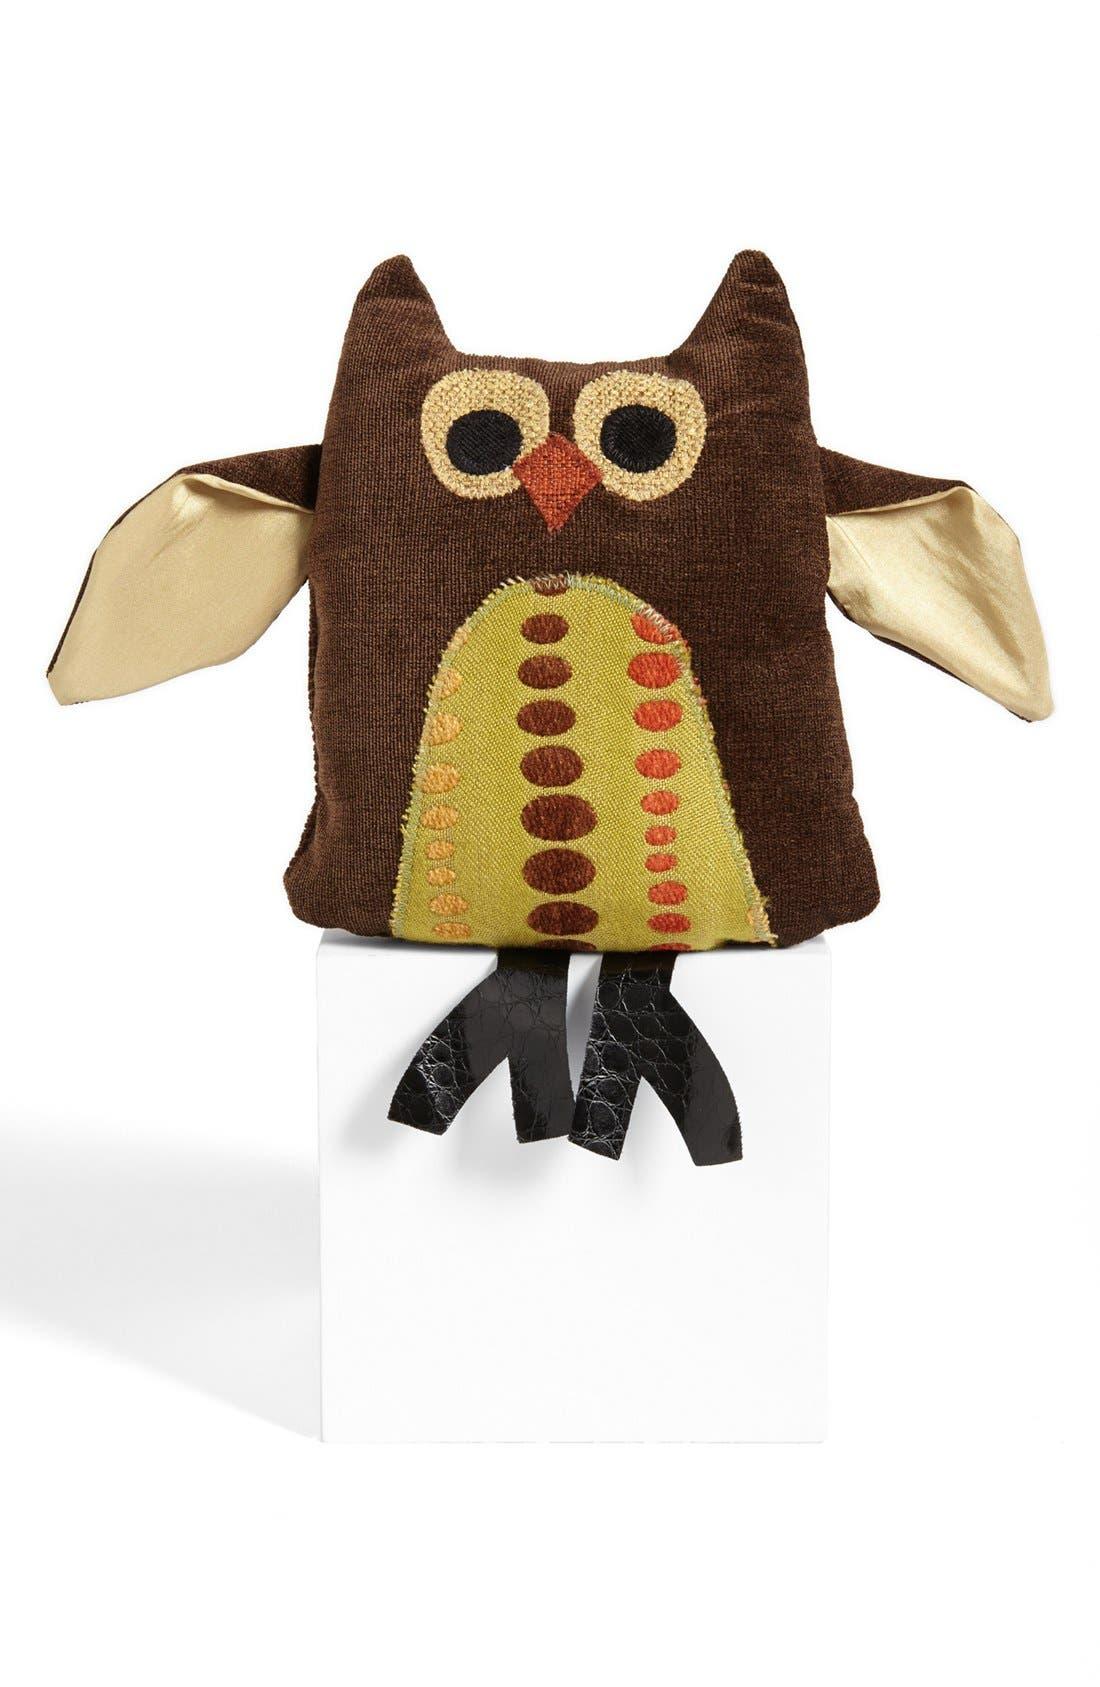 Main Image - Woof & Poof 'Kiwi Dot' Owl Bean Bag